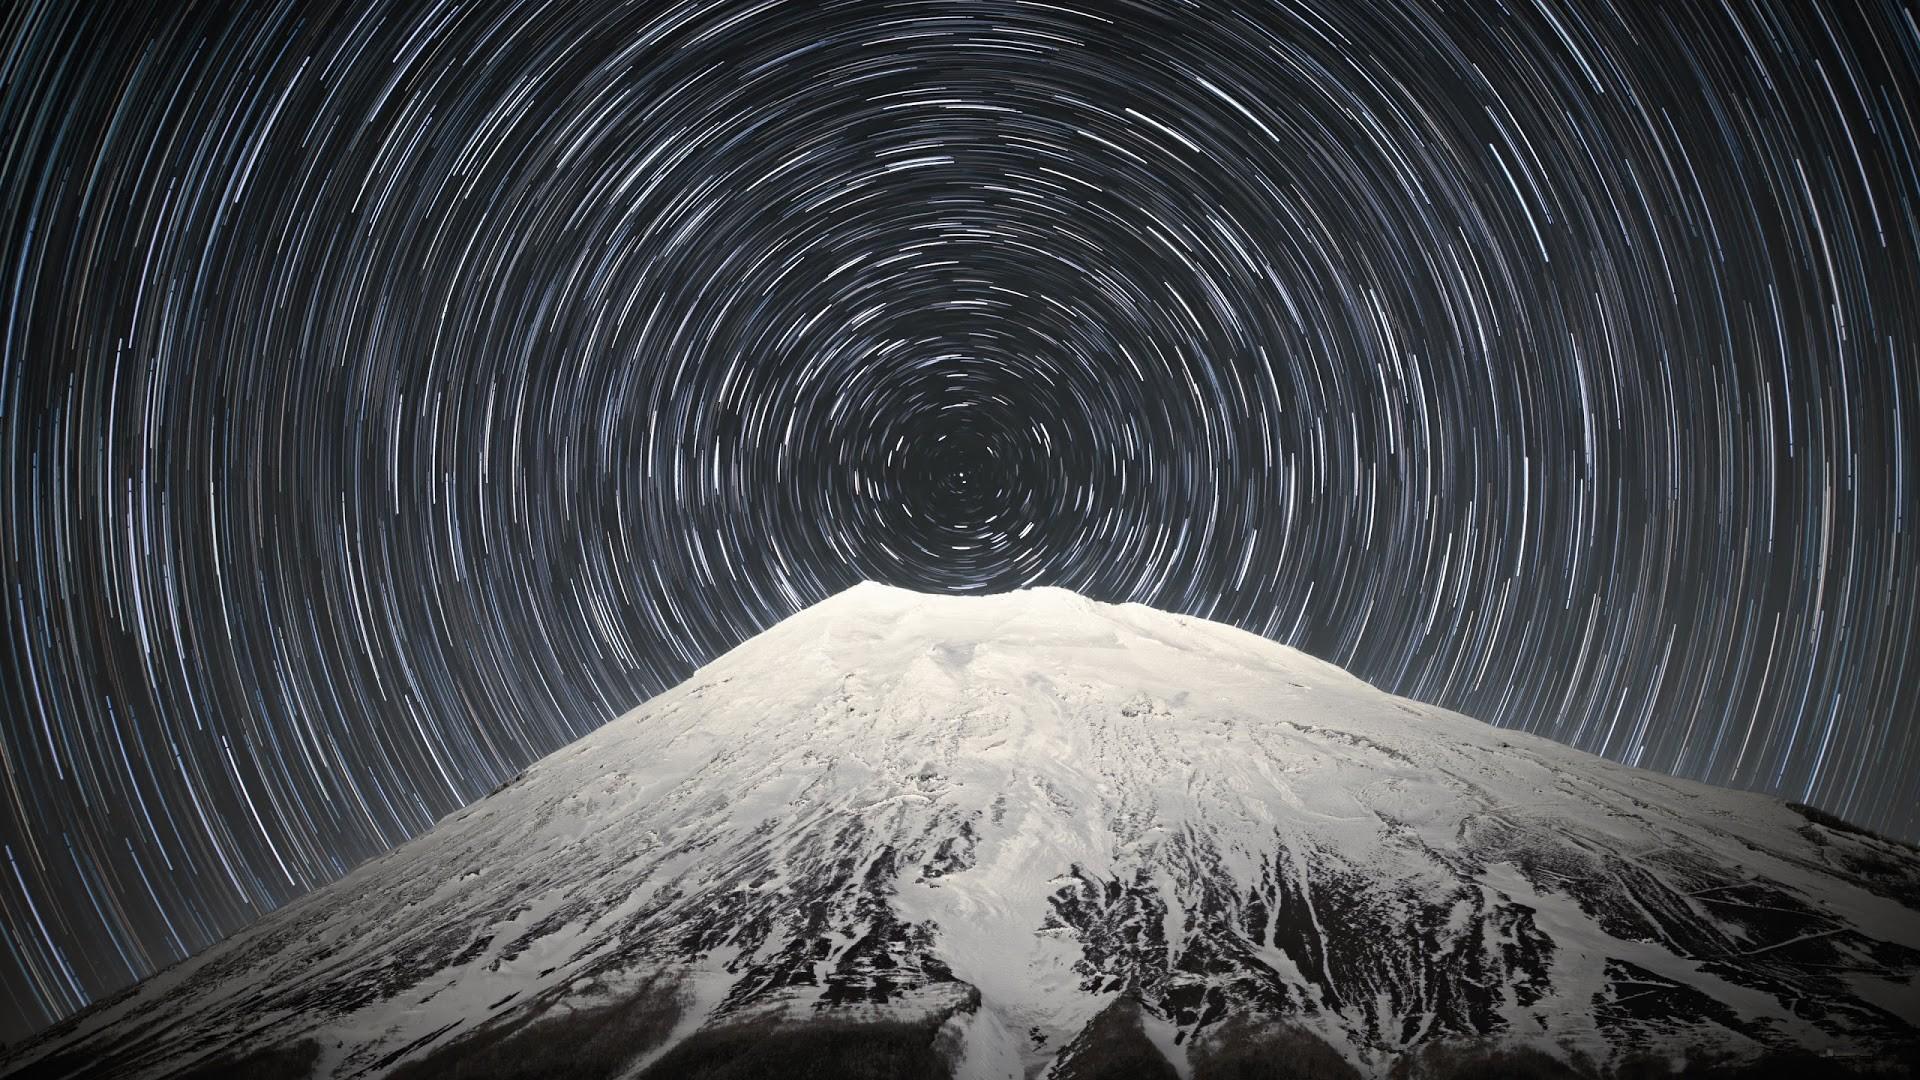 4K HD Wallpaper: Sky Full of Stars above Mount Fuji · Long Exposure  Photography ·